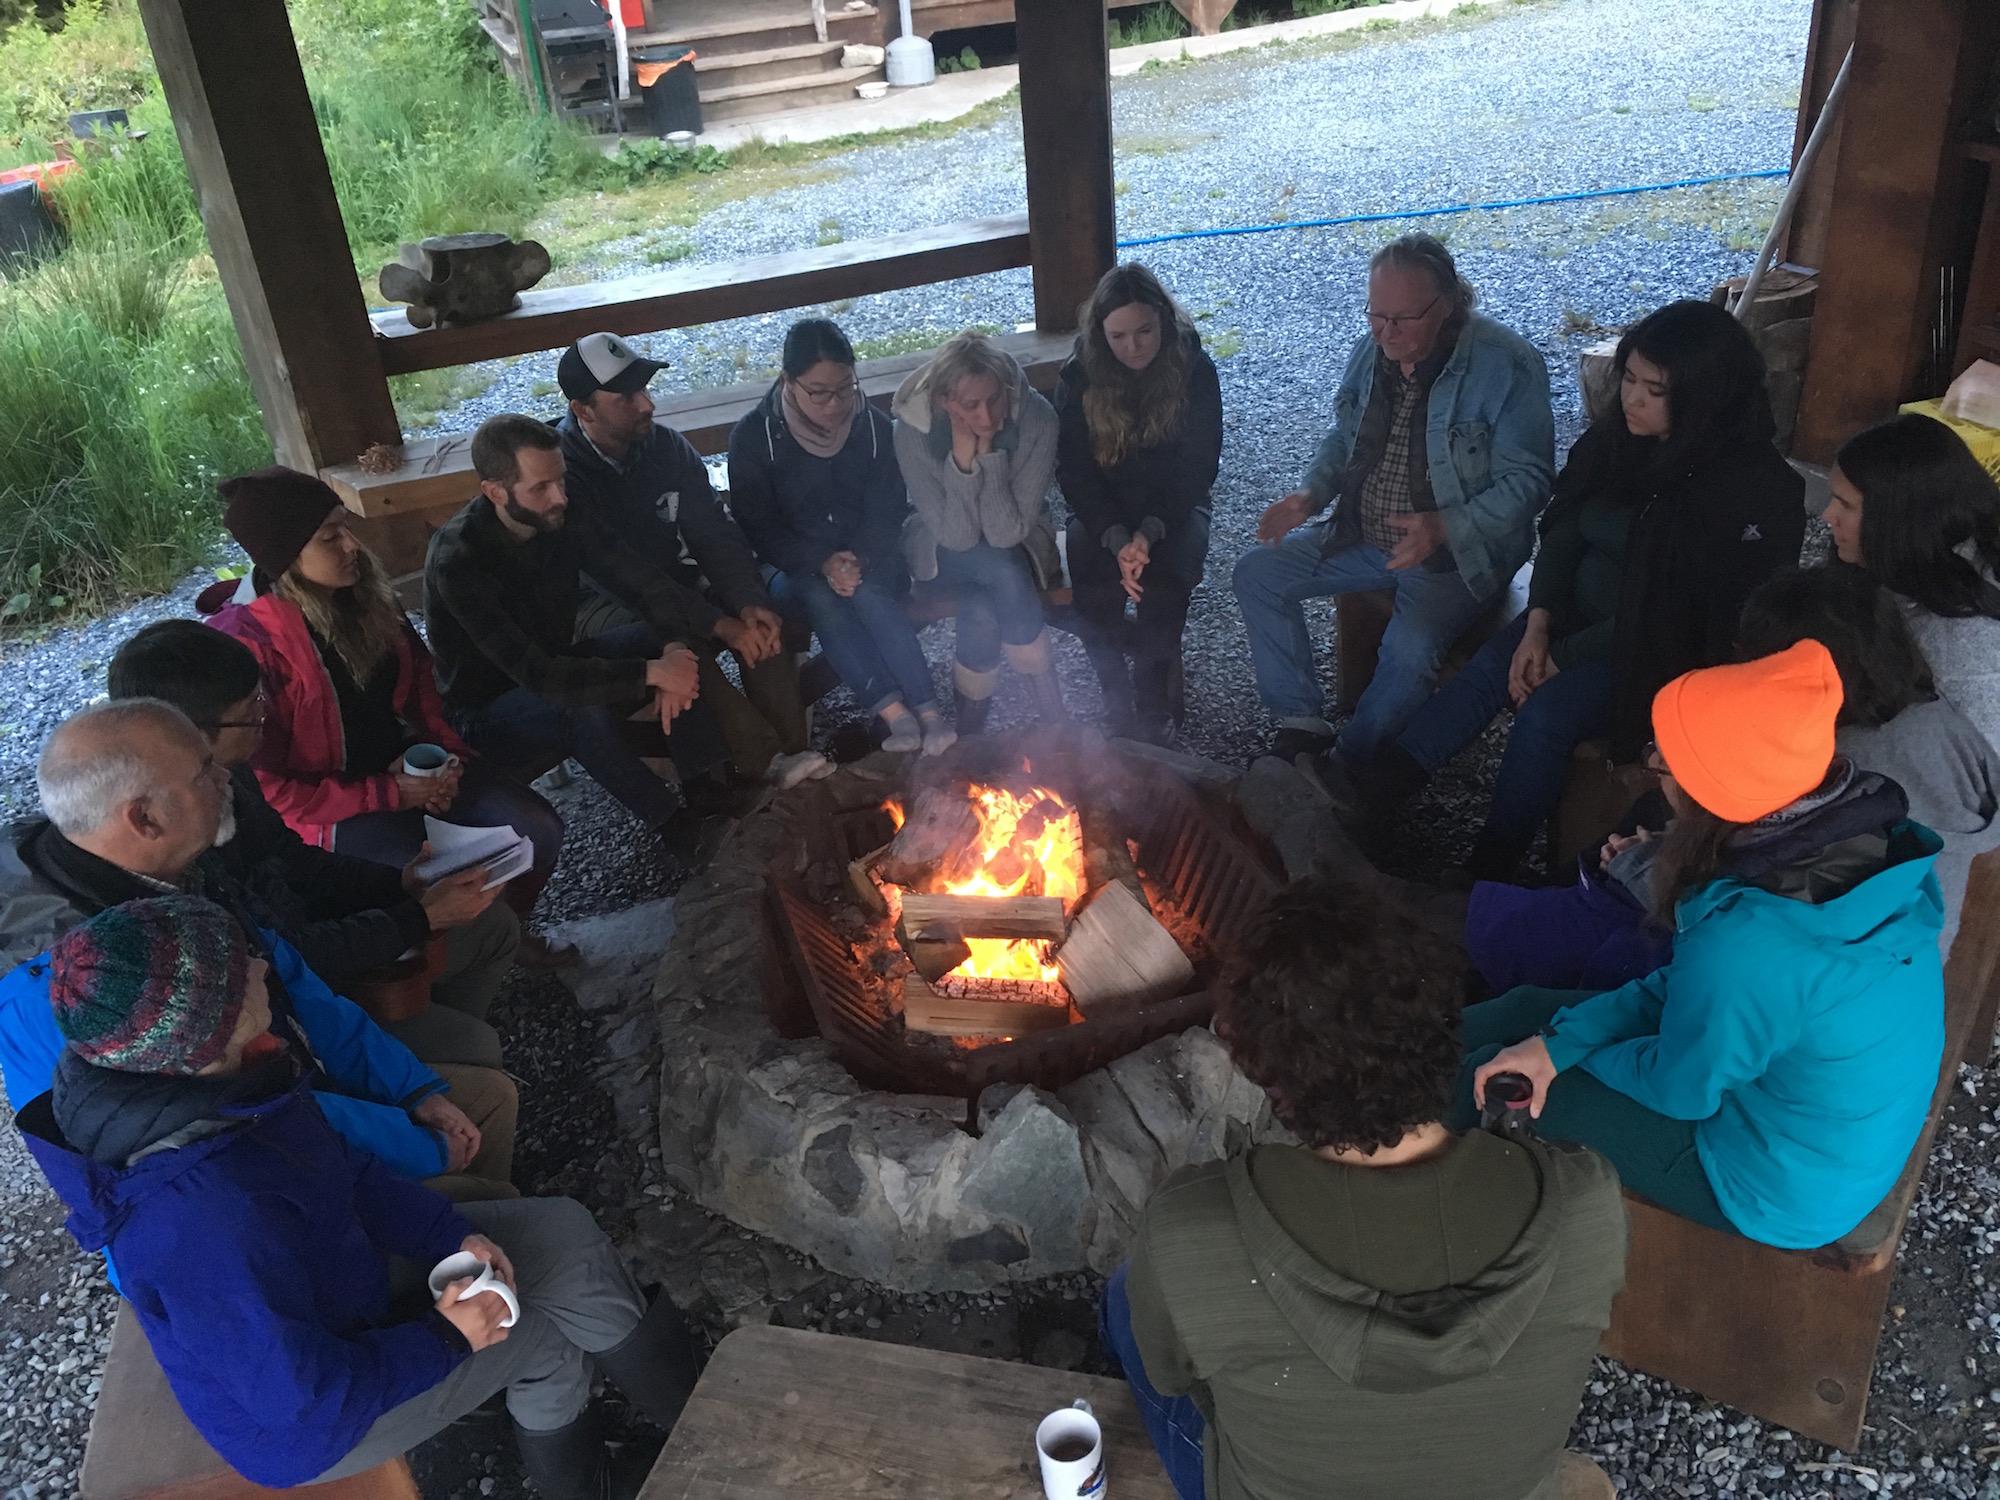 RELAW Retreat at Koeye (Photo: Georgia Lloyd-Smith)